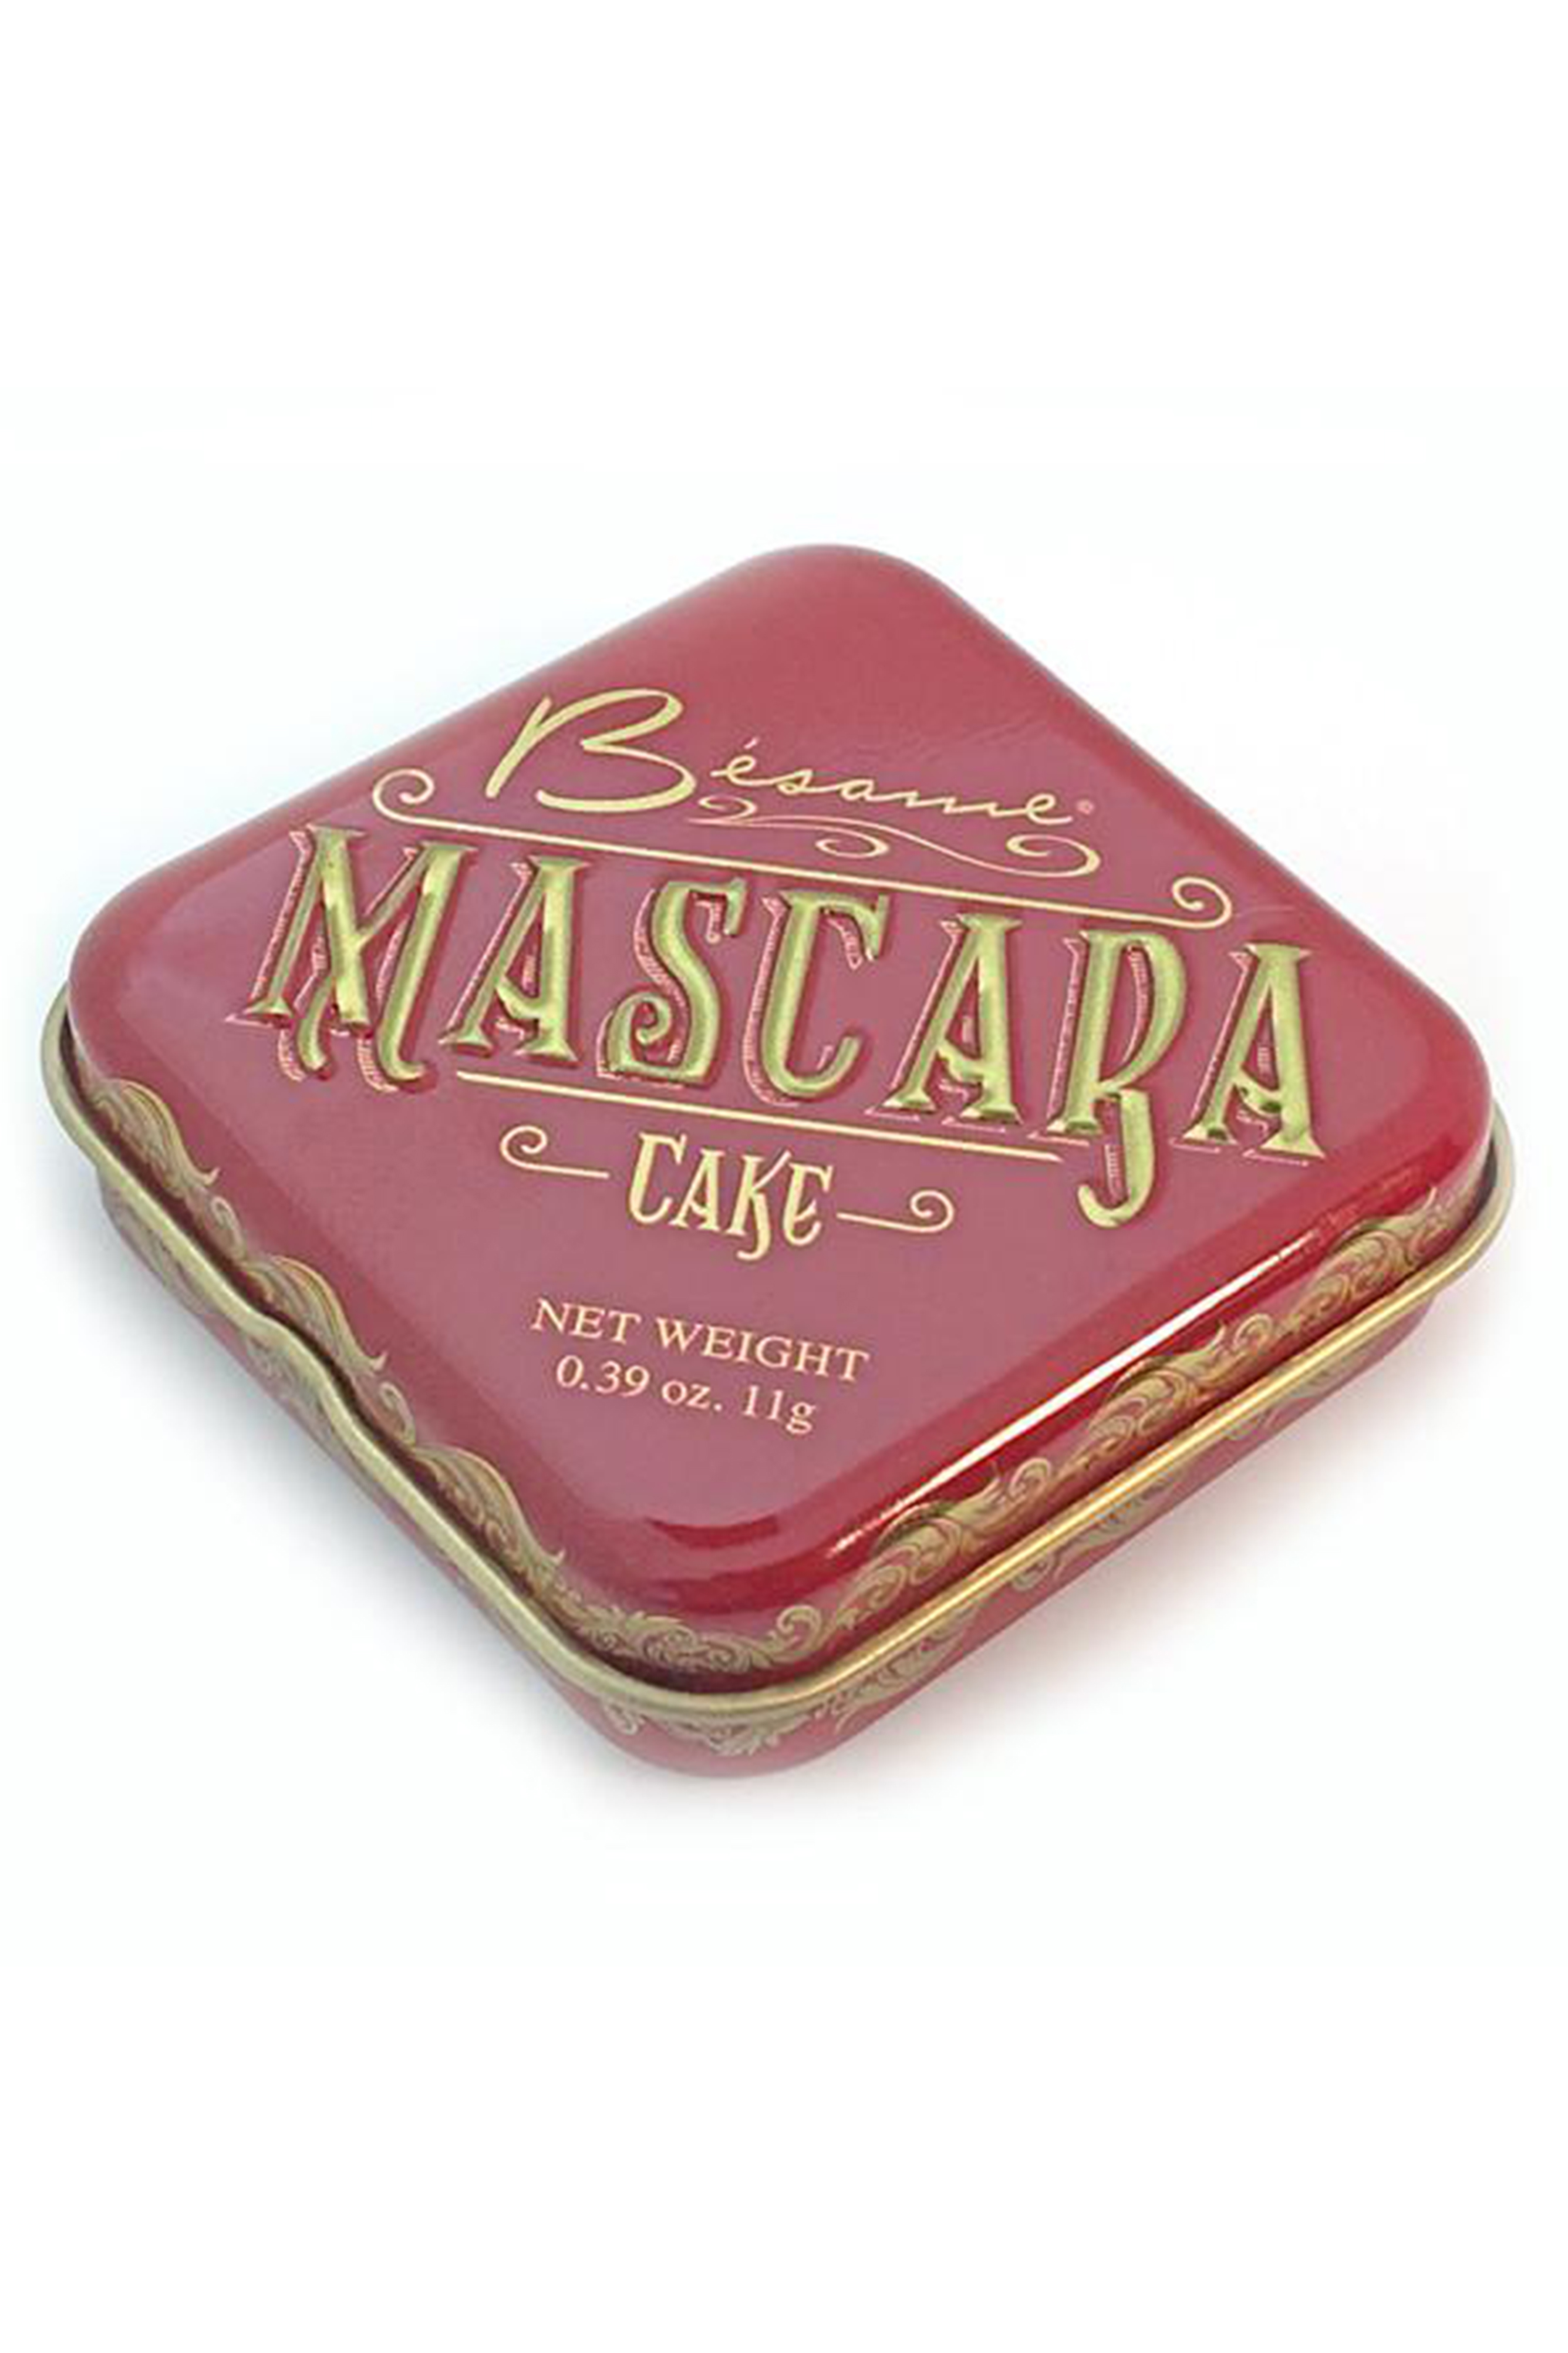 1920 - Black Cake Mascara by Bésame